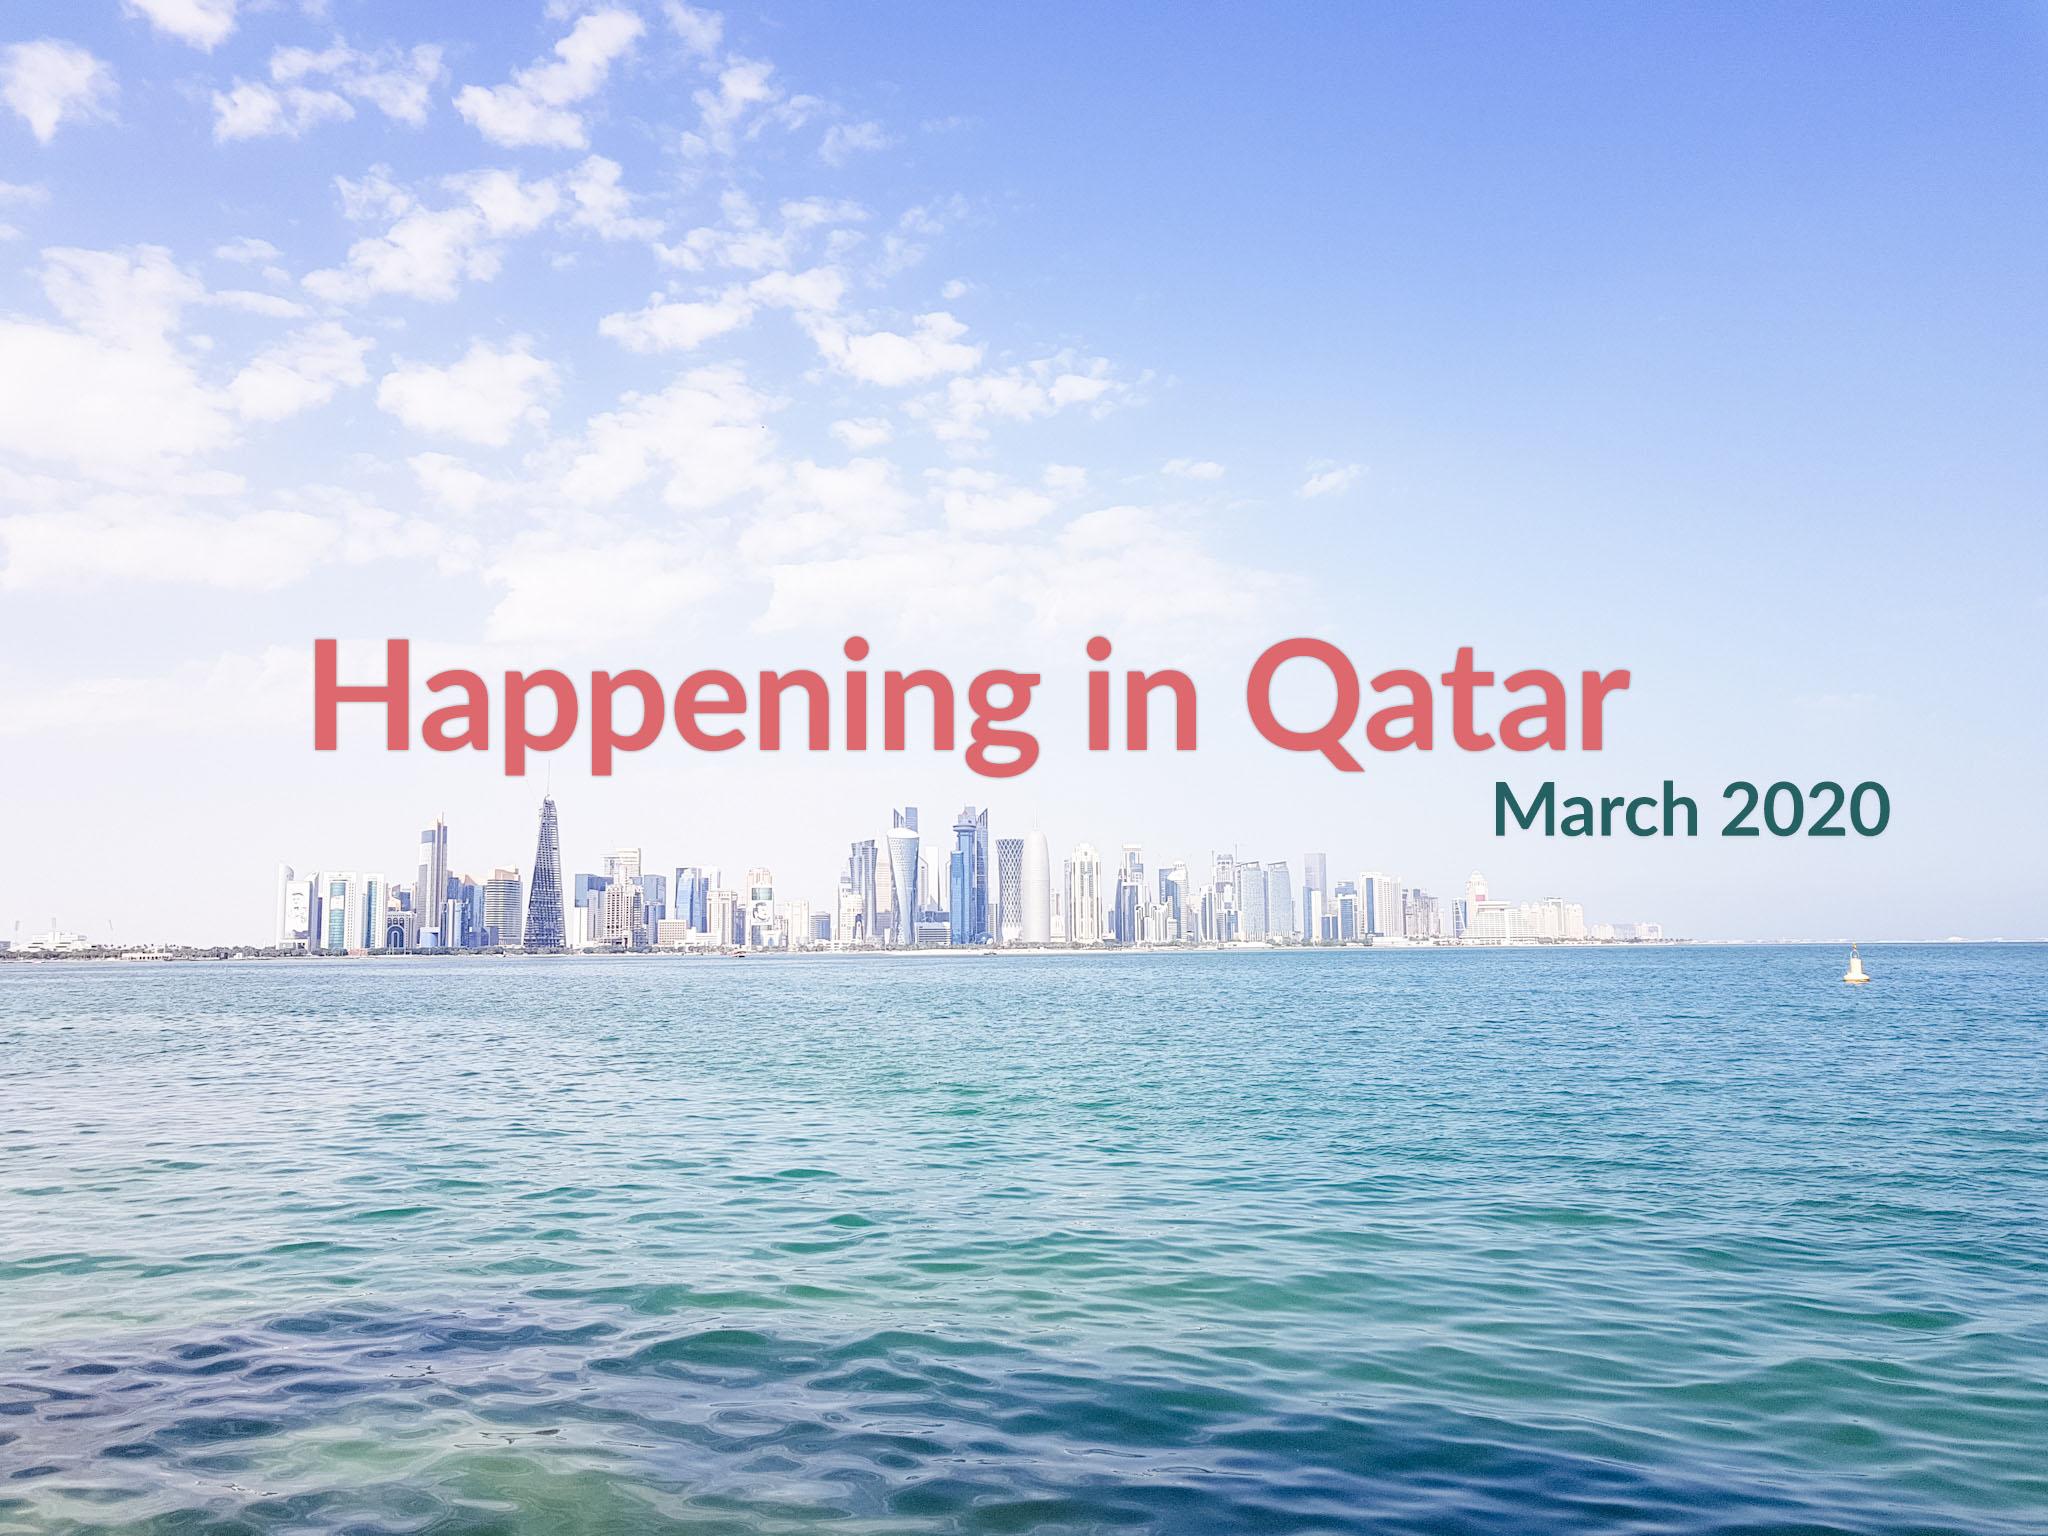 Happening in Qatar: March 2020.